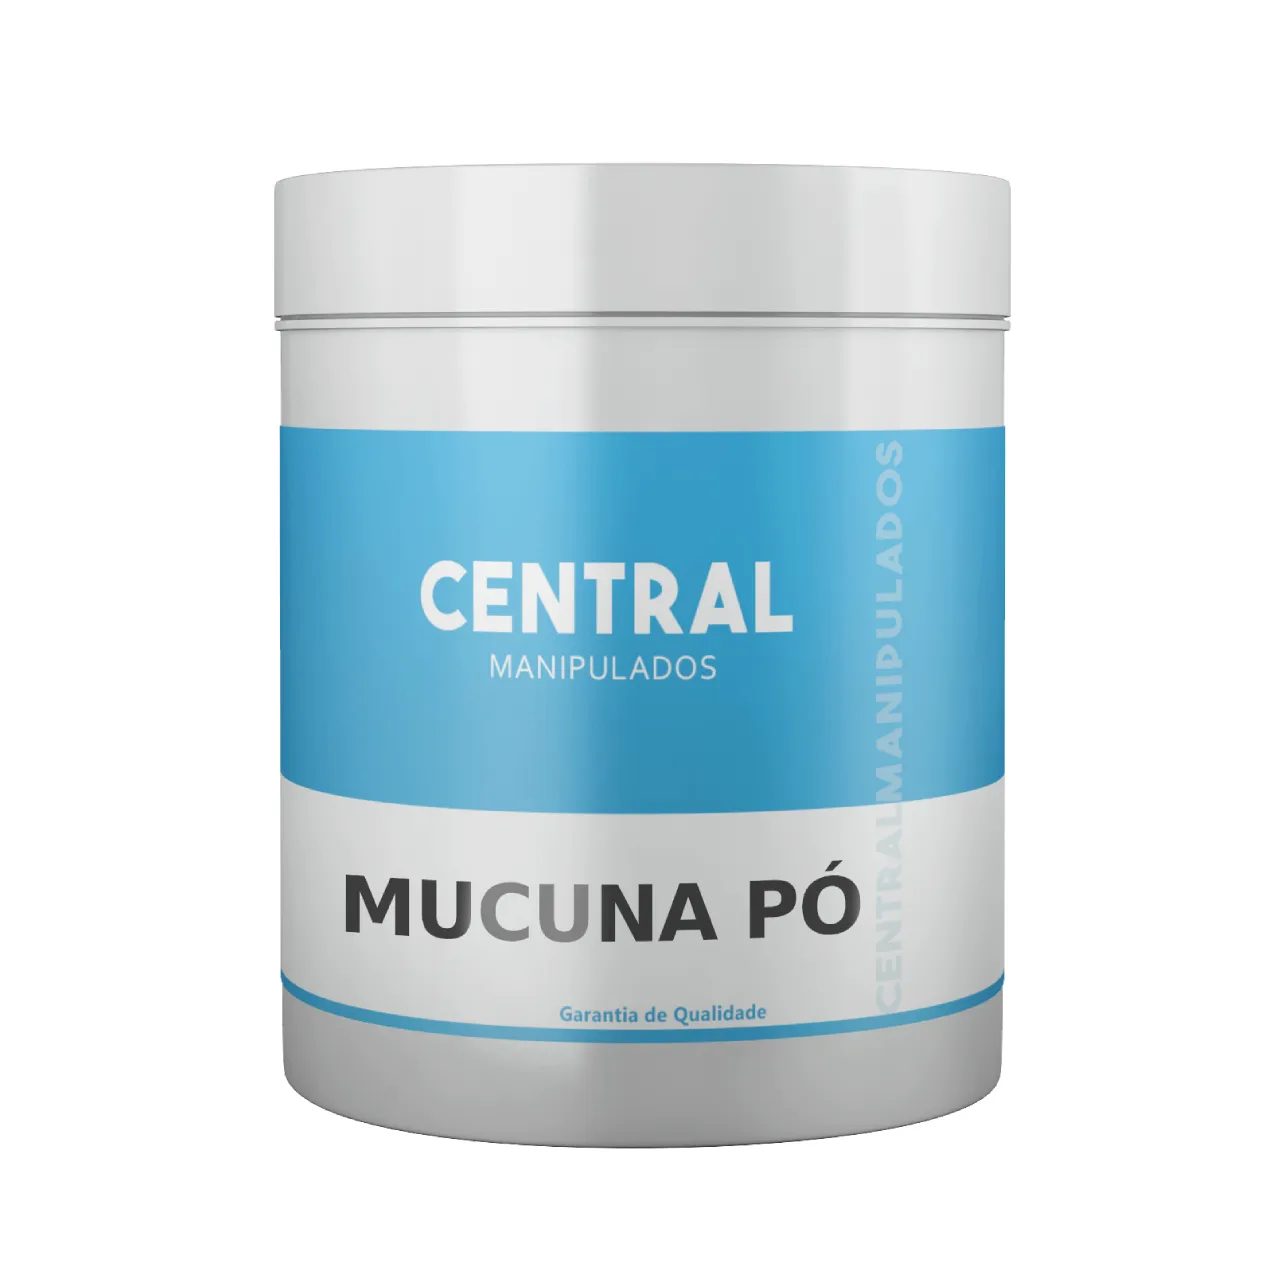 Mucuna Pruriens - 300g em Pó - Performance, Aumento da Testosterona, Saúde Sexual